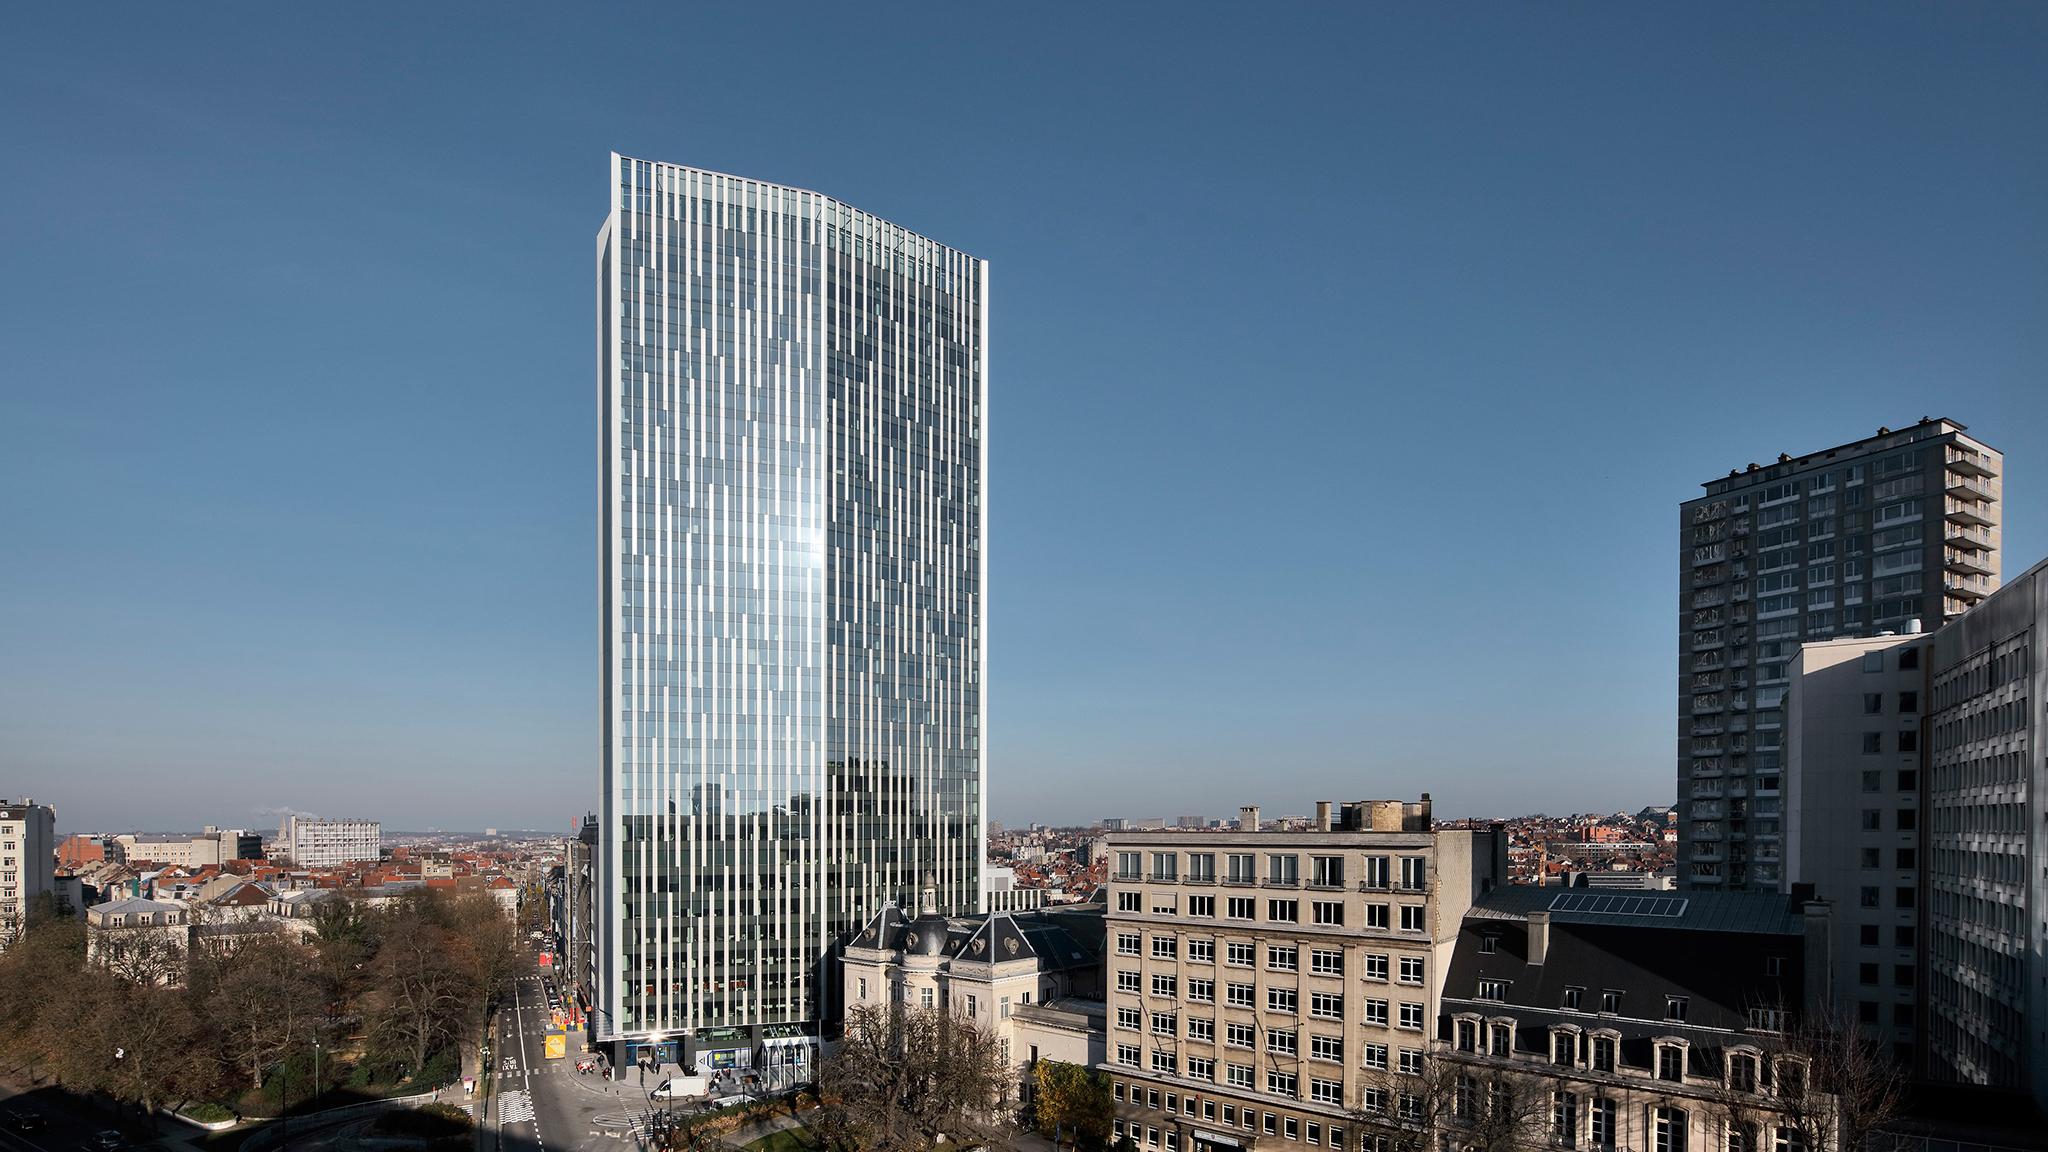 marca espaa el edificio ecolgico ms alto de europa lleva firma espaola reproducir audio